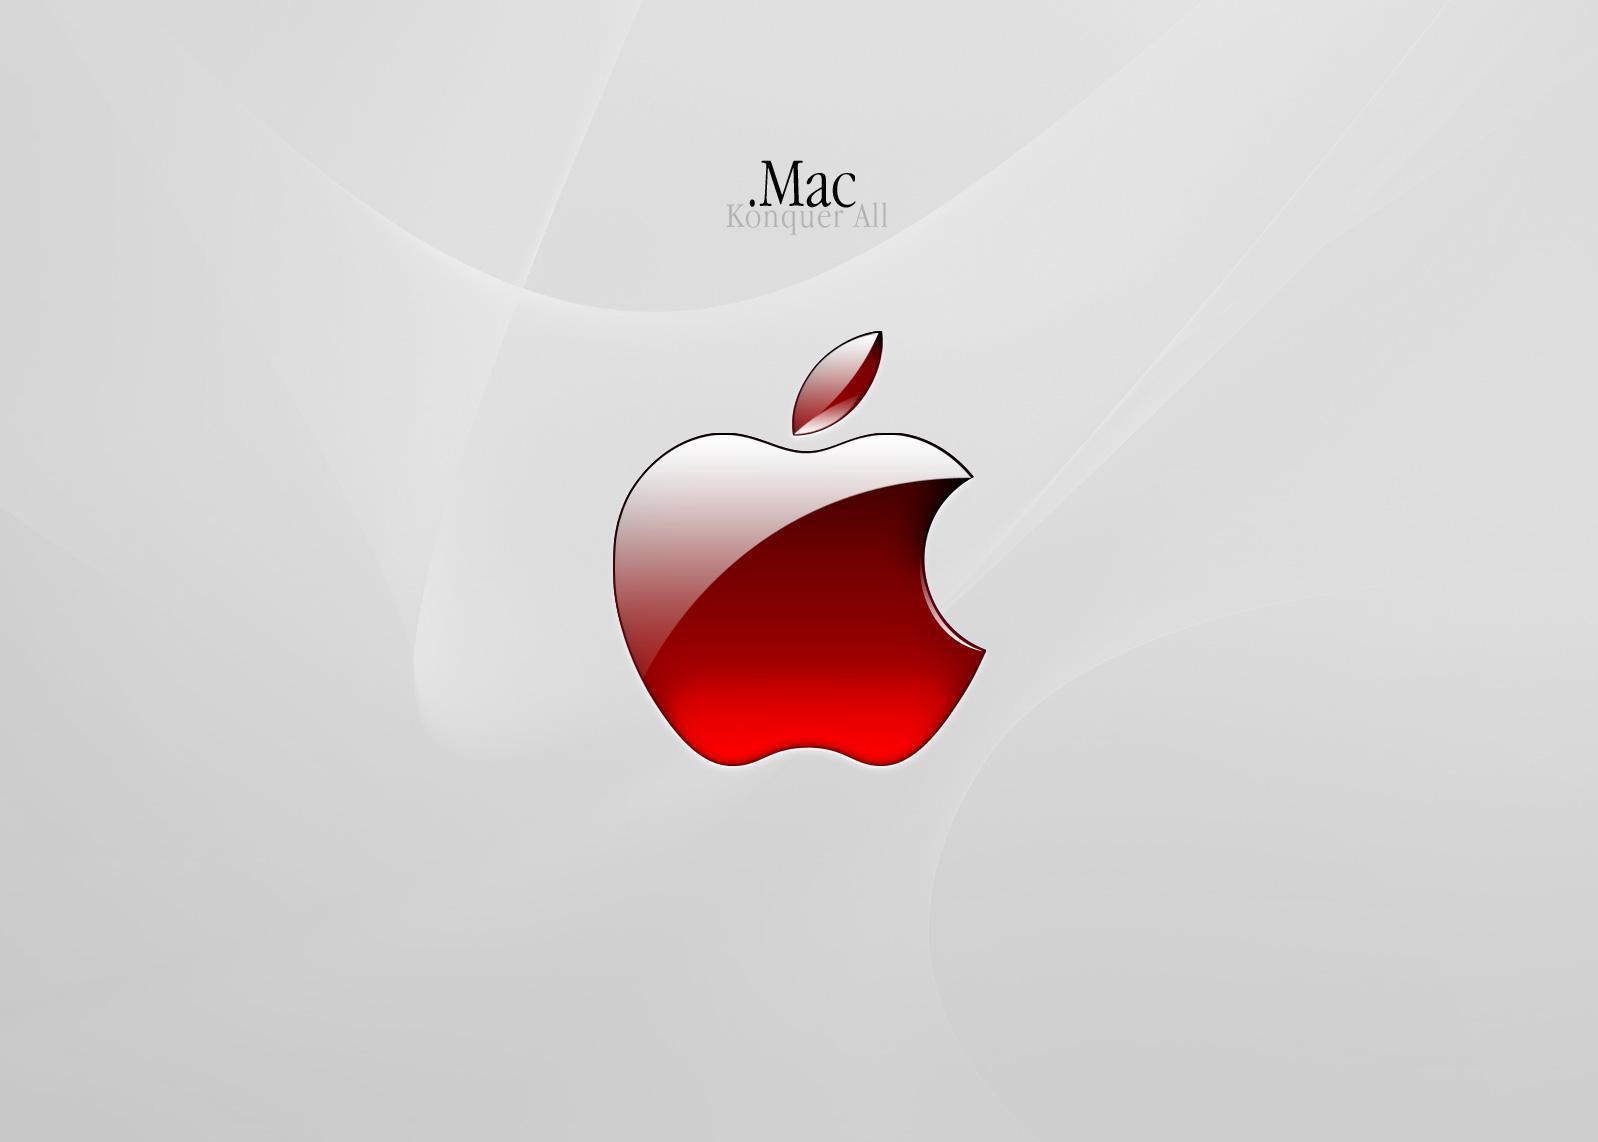 Apple Blackberry Mac Iphone HQ Wallpapers 1598x1142